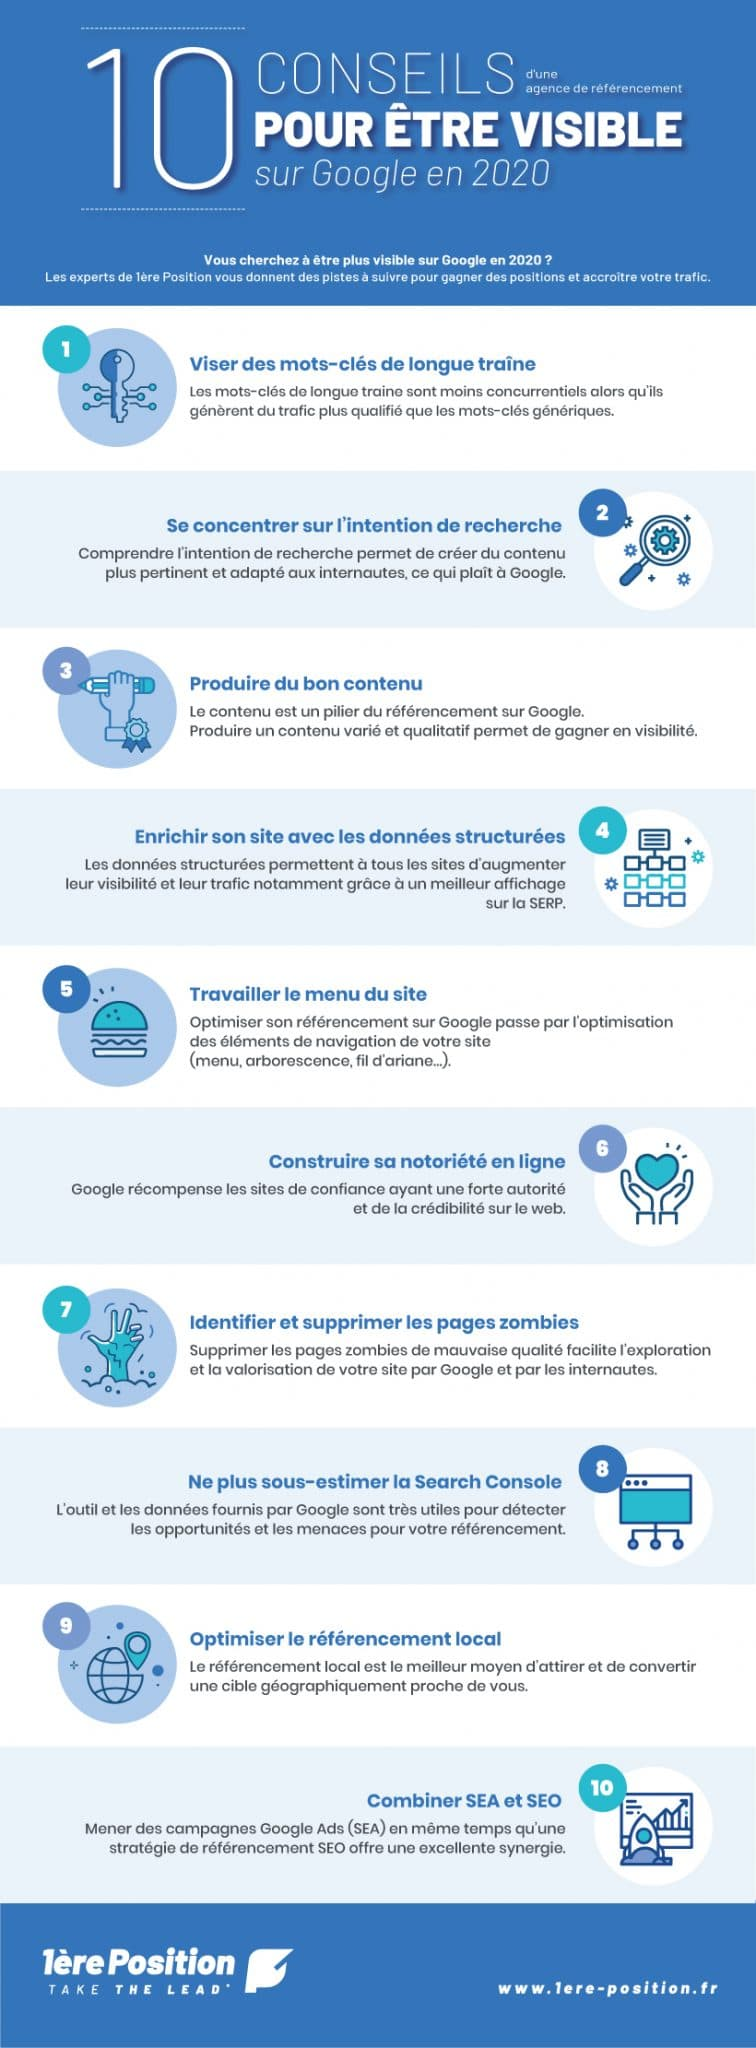 infographie-conseils-visibilite-google-2020